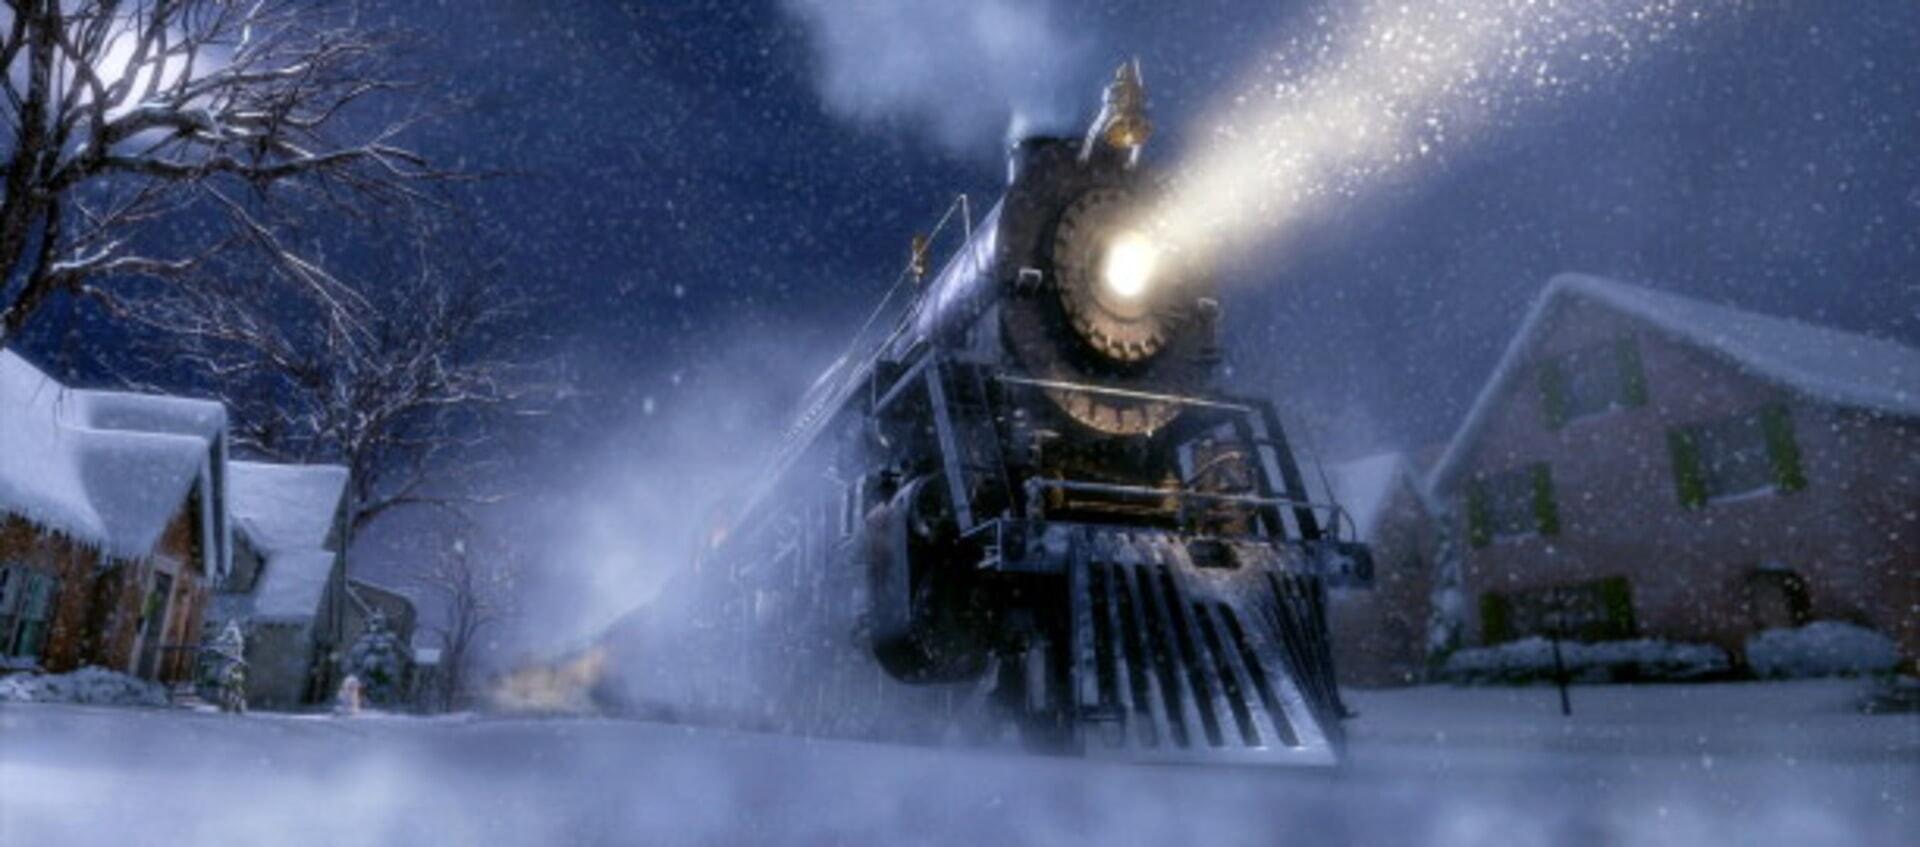 The Polar Express - Image 17